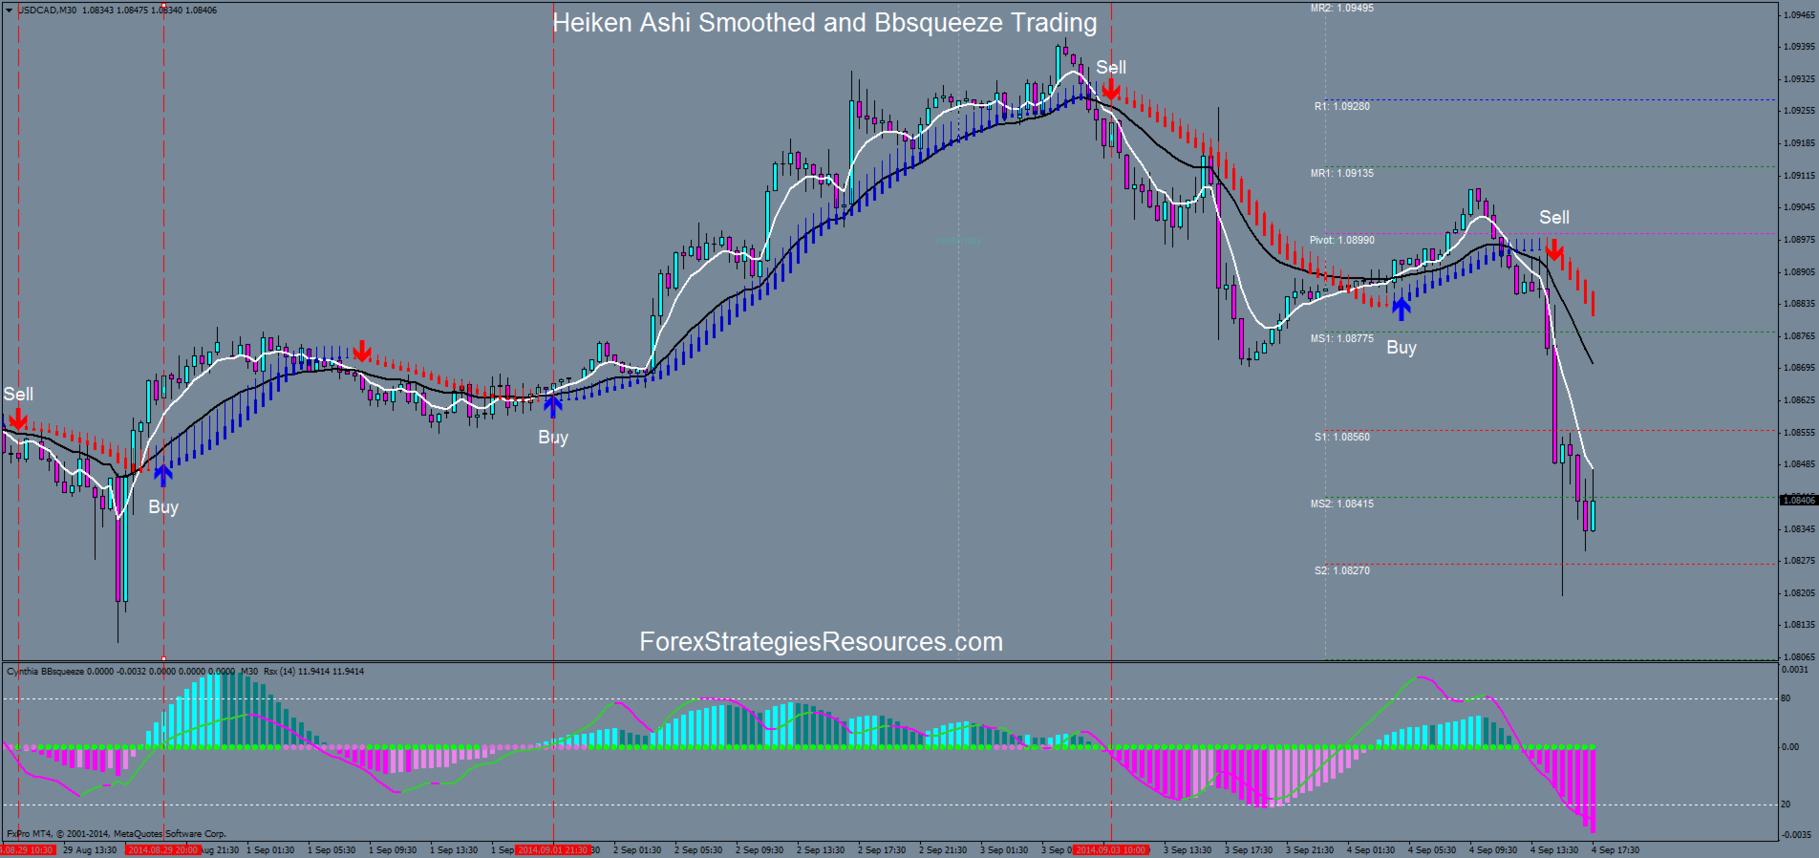 Heiken snake forex trading system